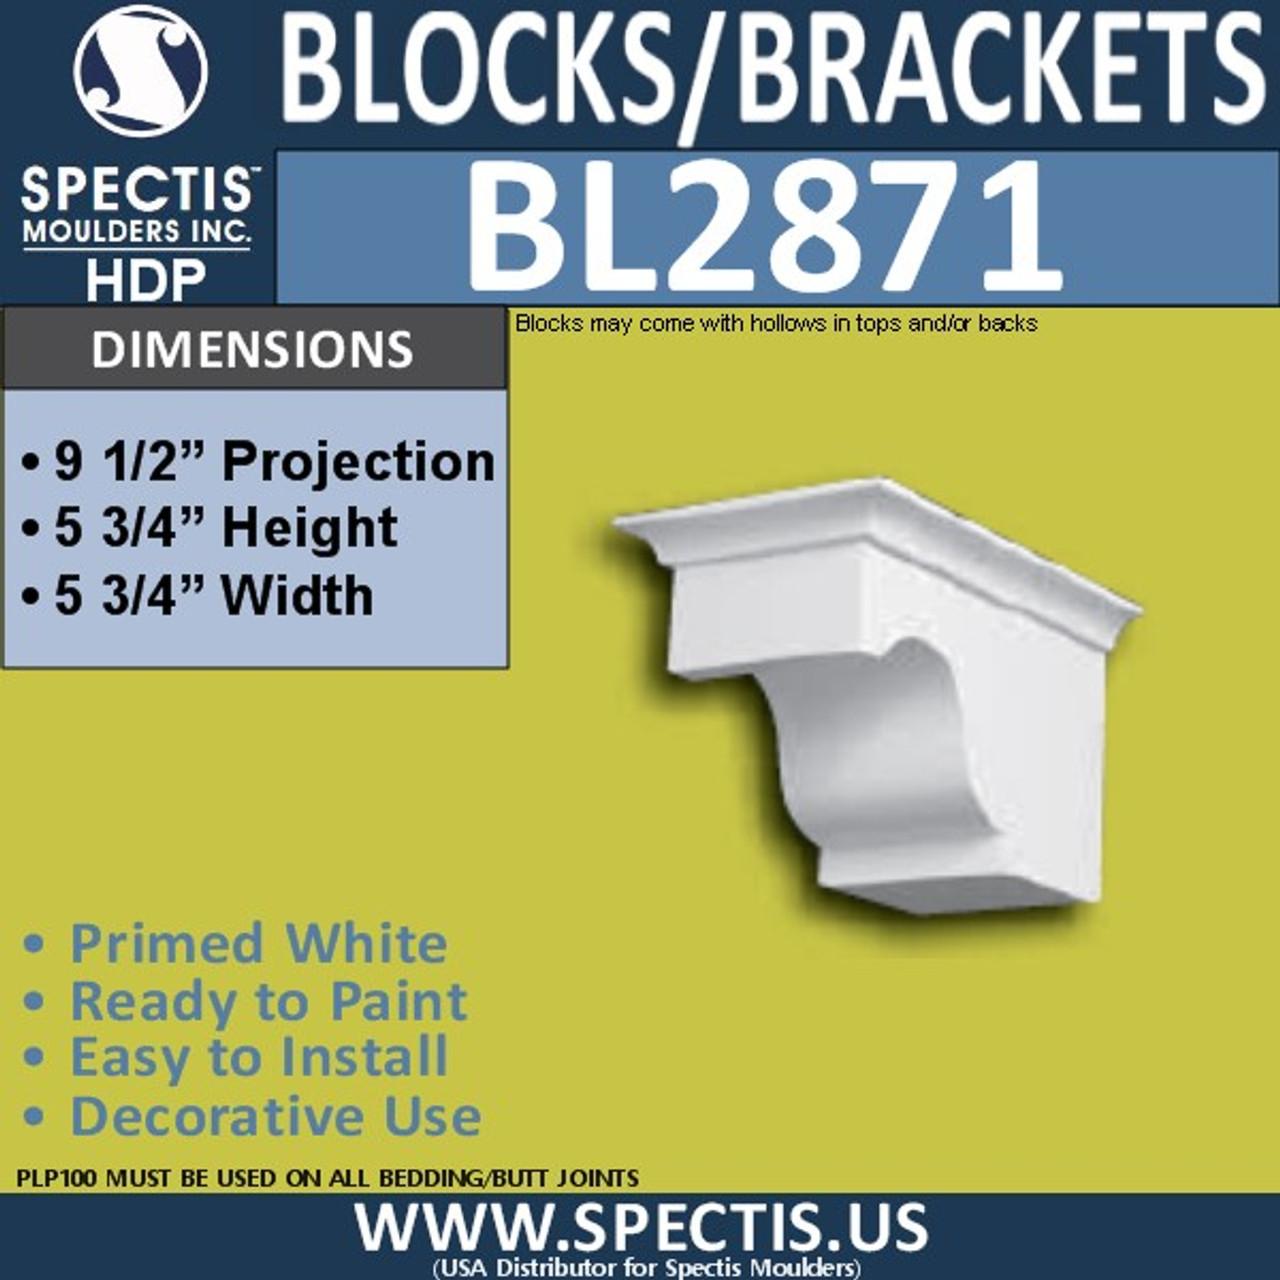 "BL2871 Eave Block or Bracket 5.75""W x 5.75""H x 9.5"" P"